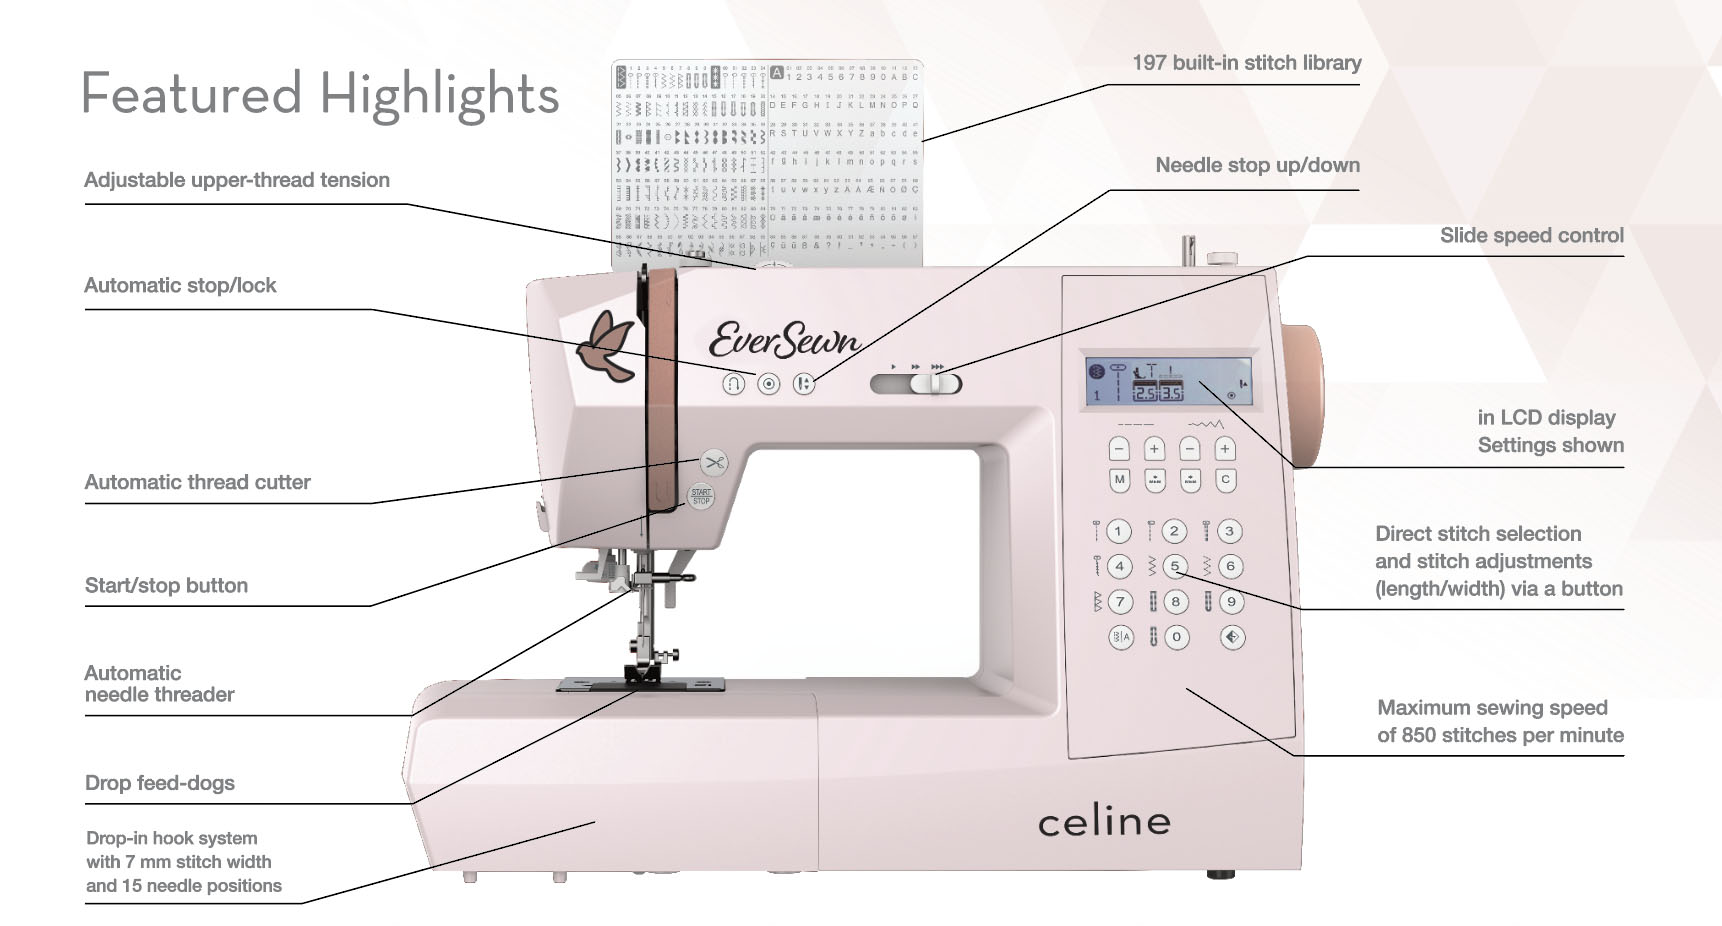 EverSewn_celine_features.jpg